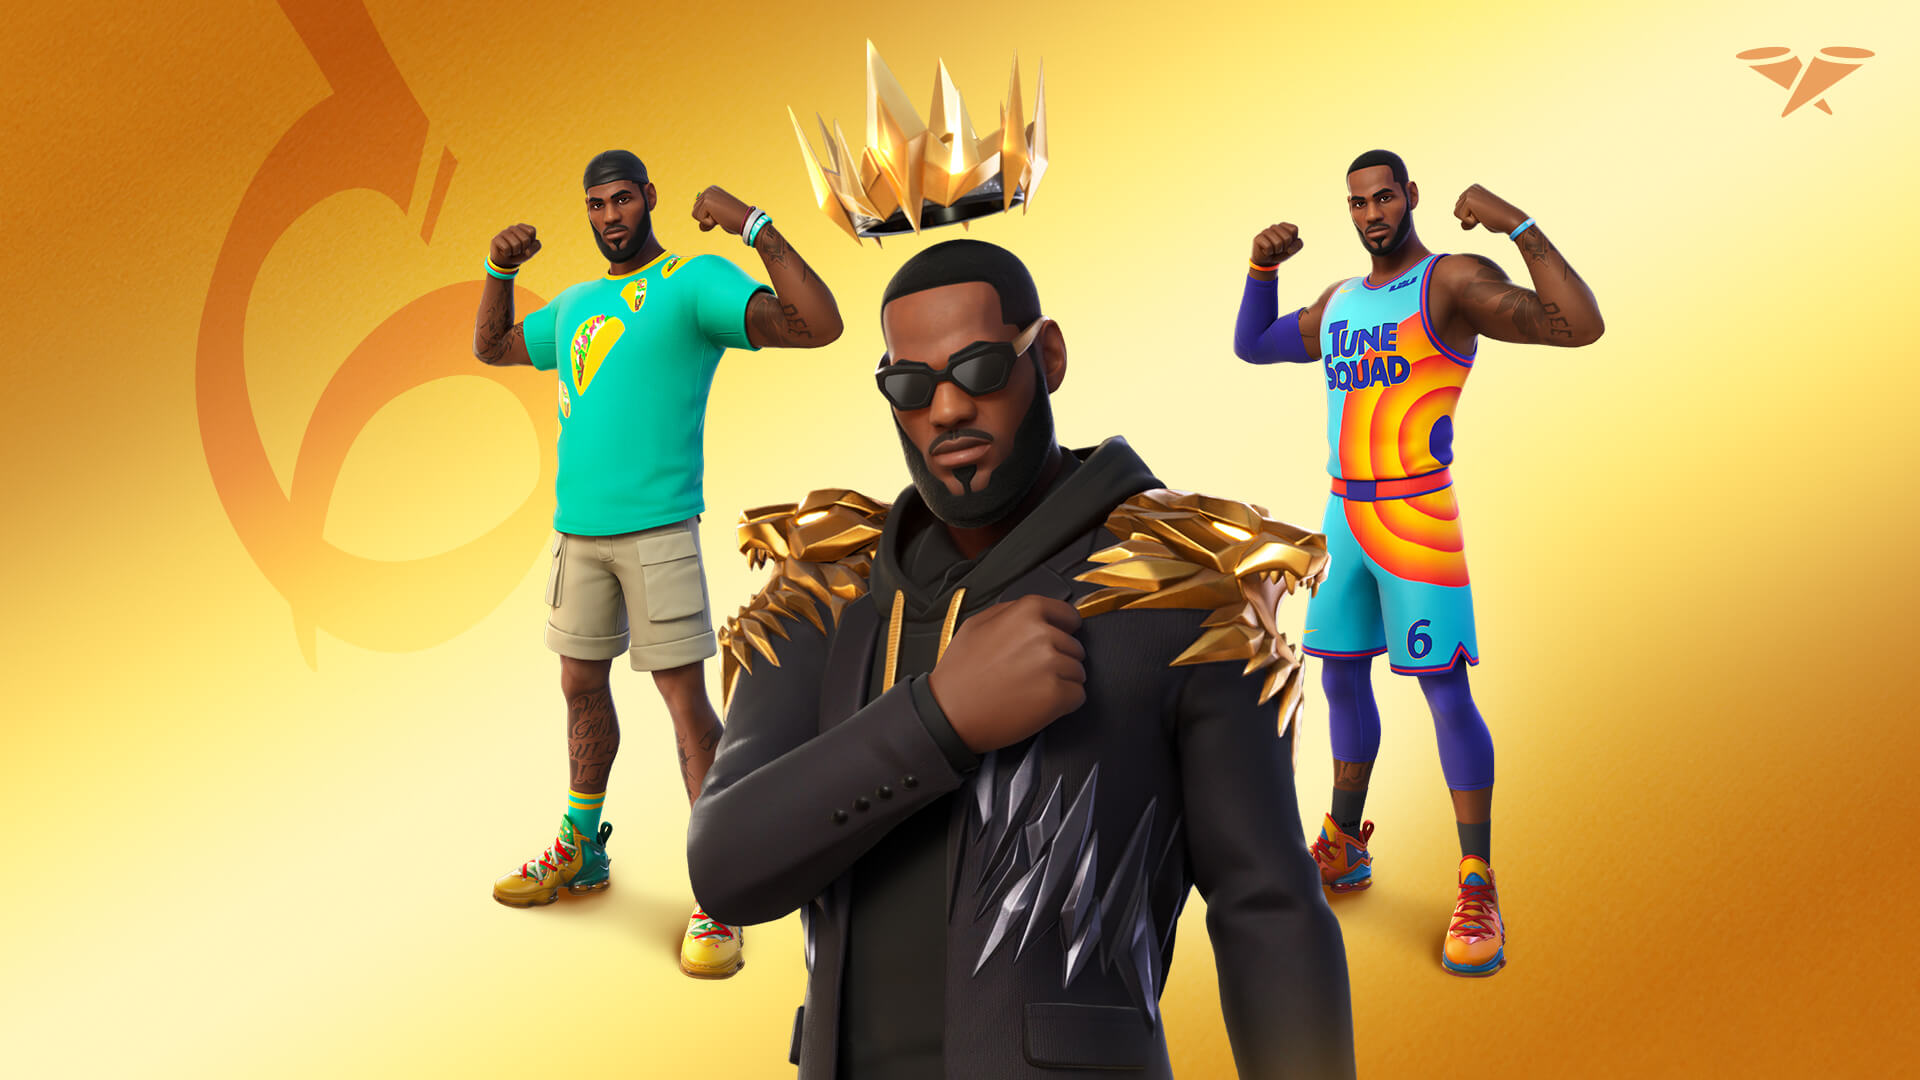 Fortnite добавляет звезду НБА Леброна Джеймса в серию Icon